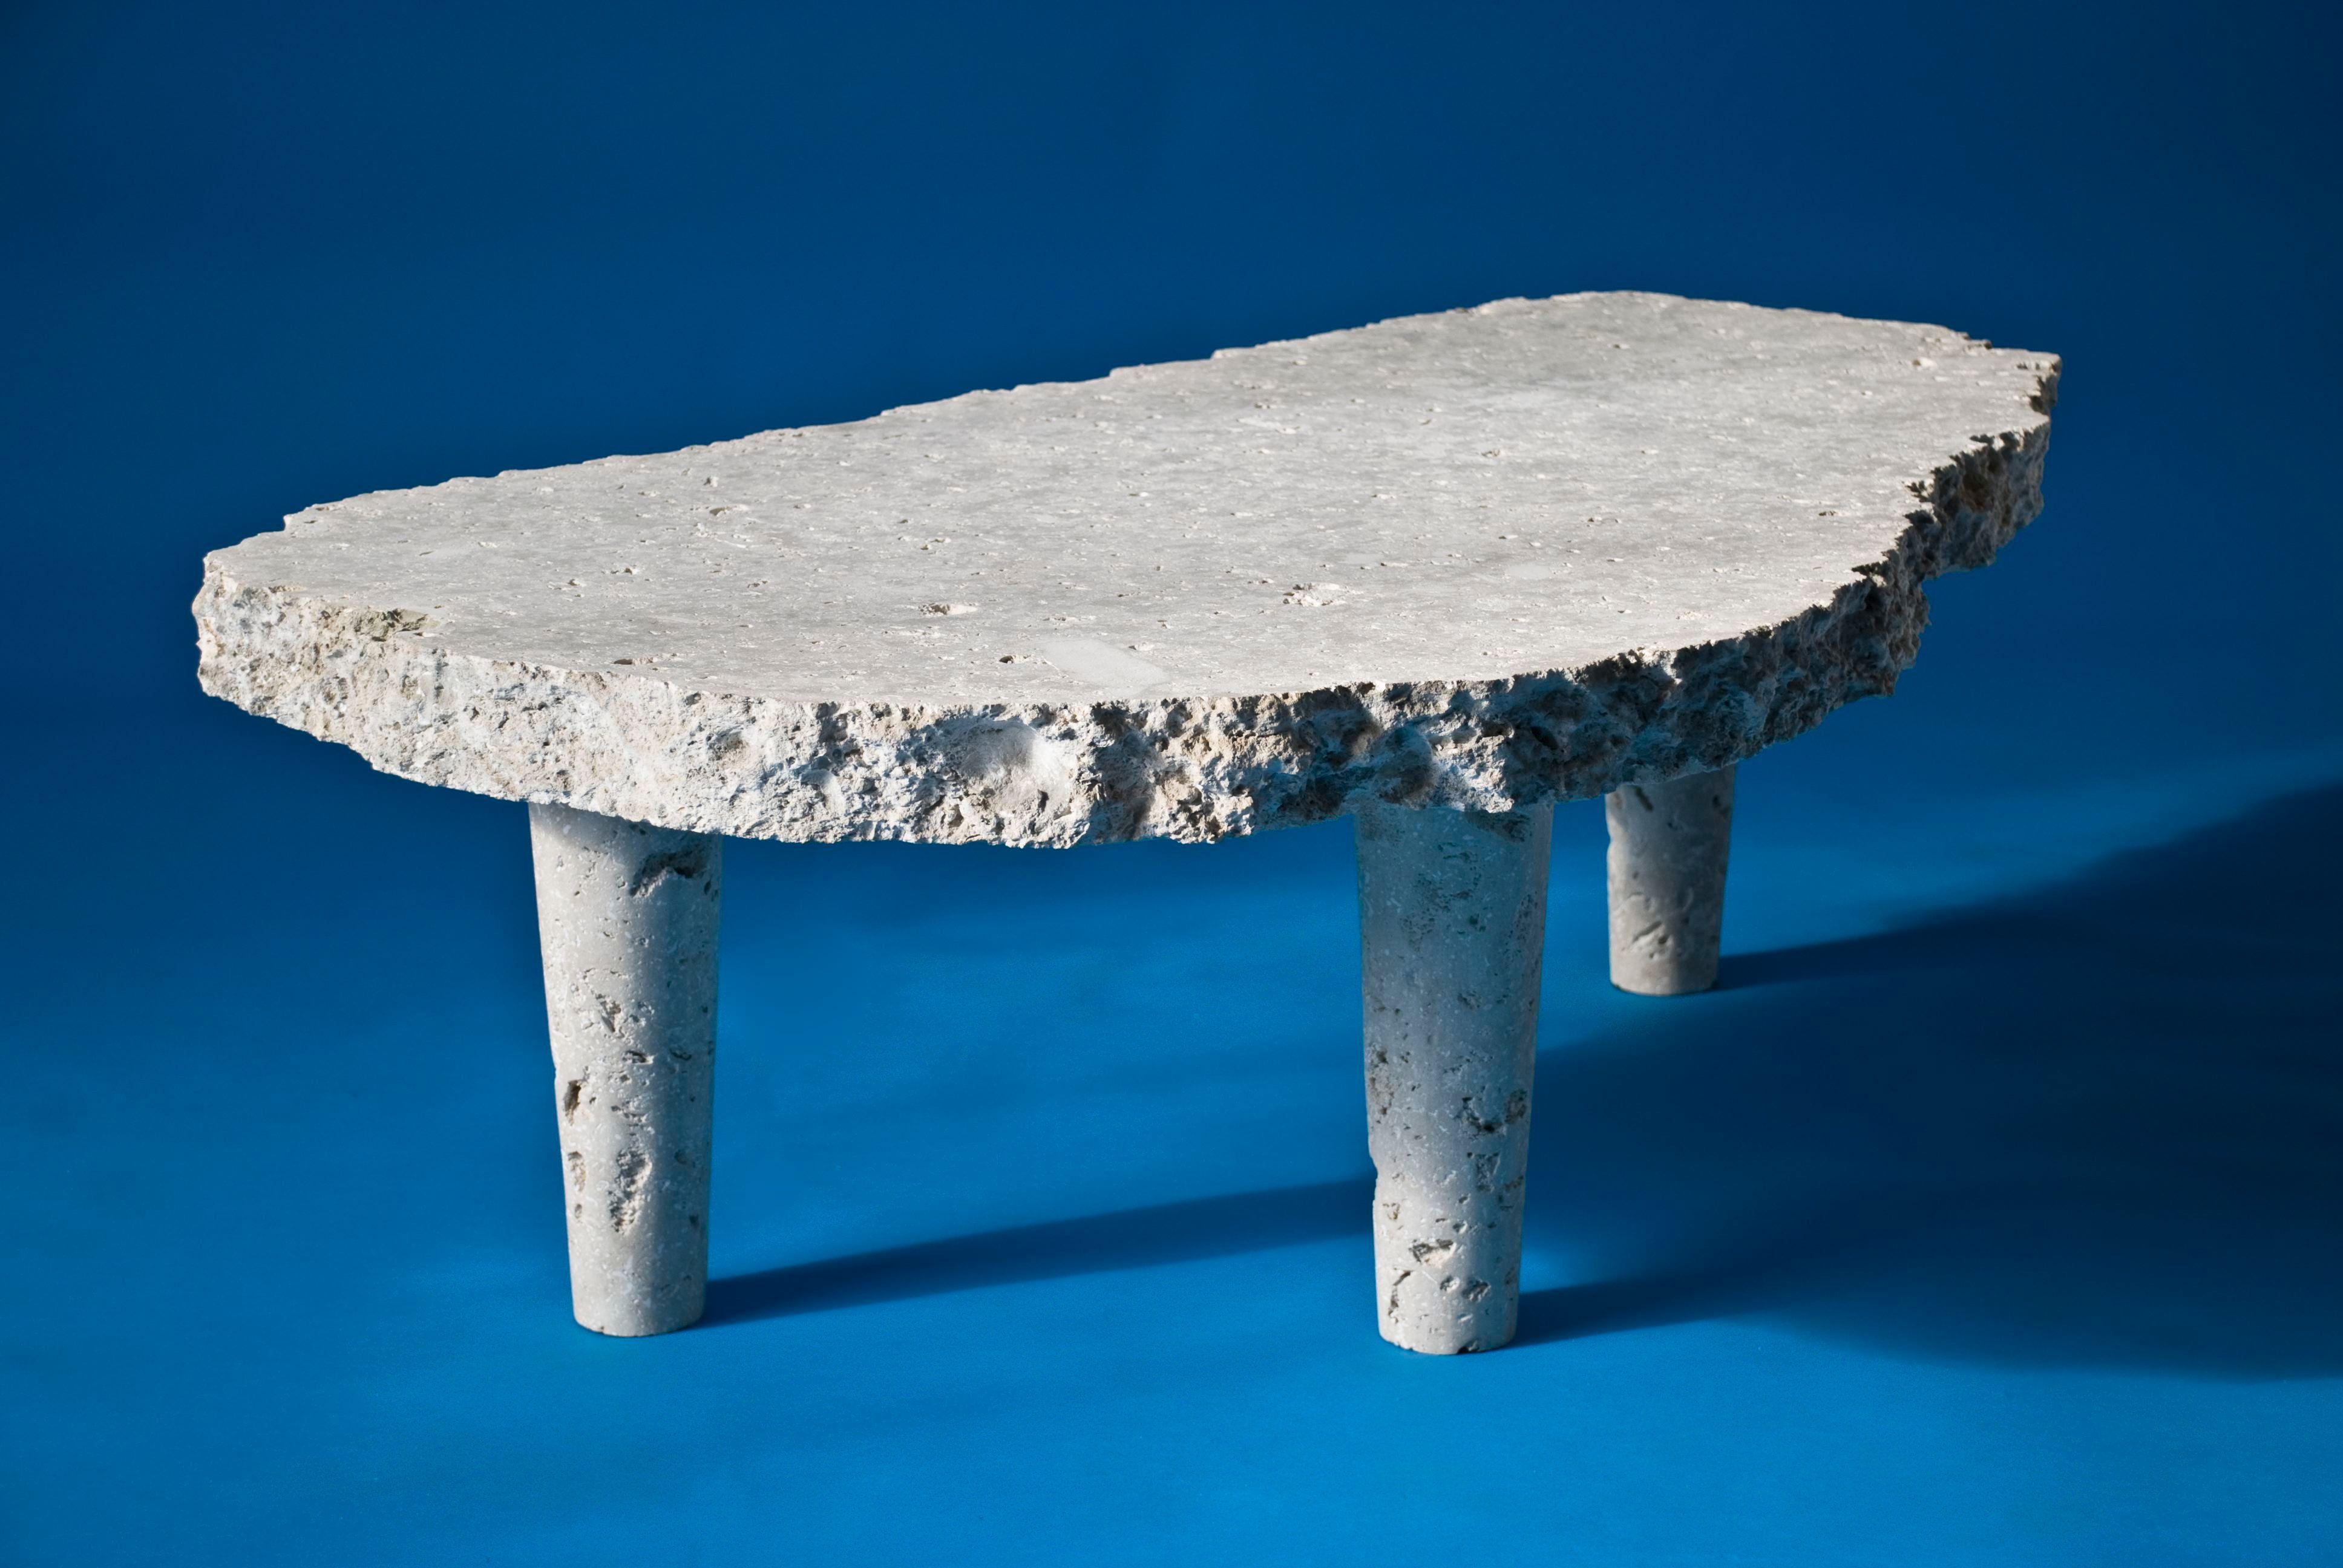 Dowiyogo´s Ancient Coral Coffee Table | Coral Limestone from the island of Nauru | 120 x 80 x 45 cm | 2009